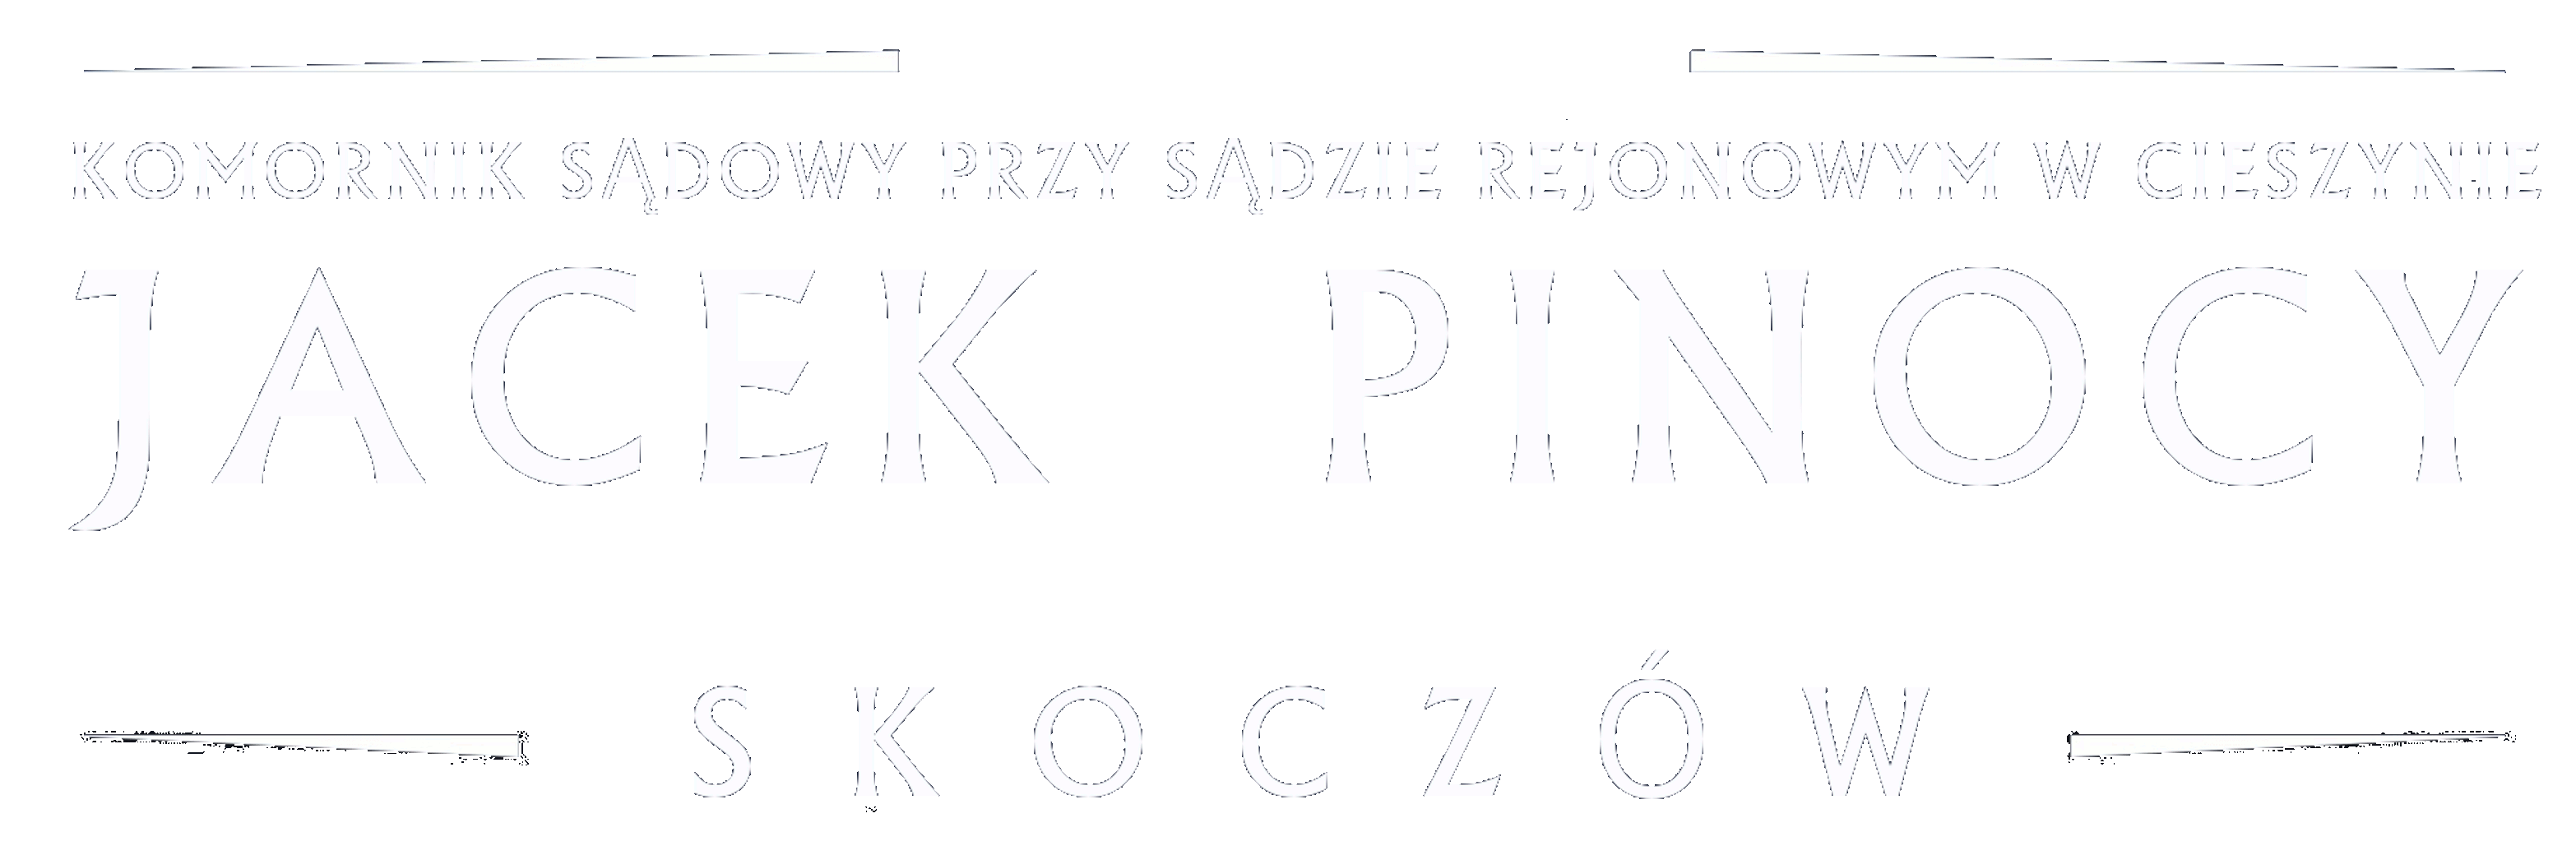 Komornik Jacek Pinocy